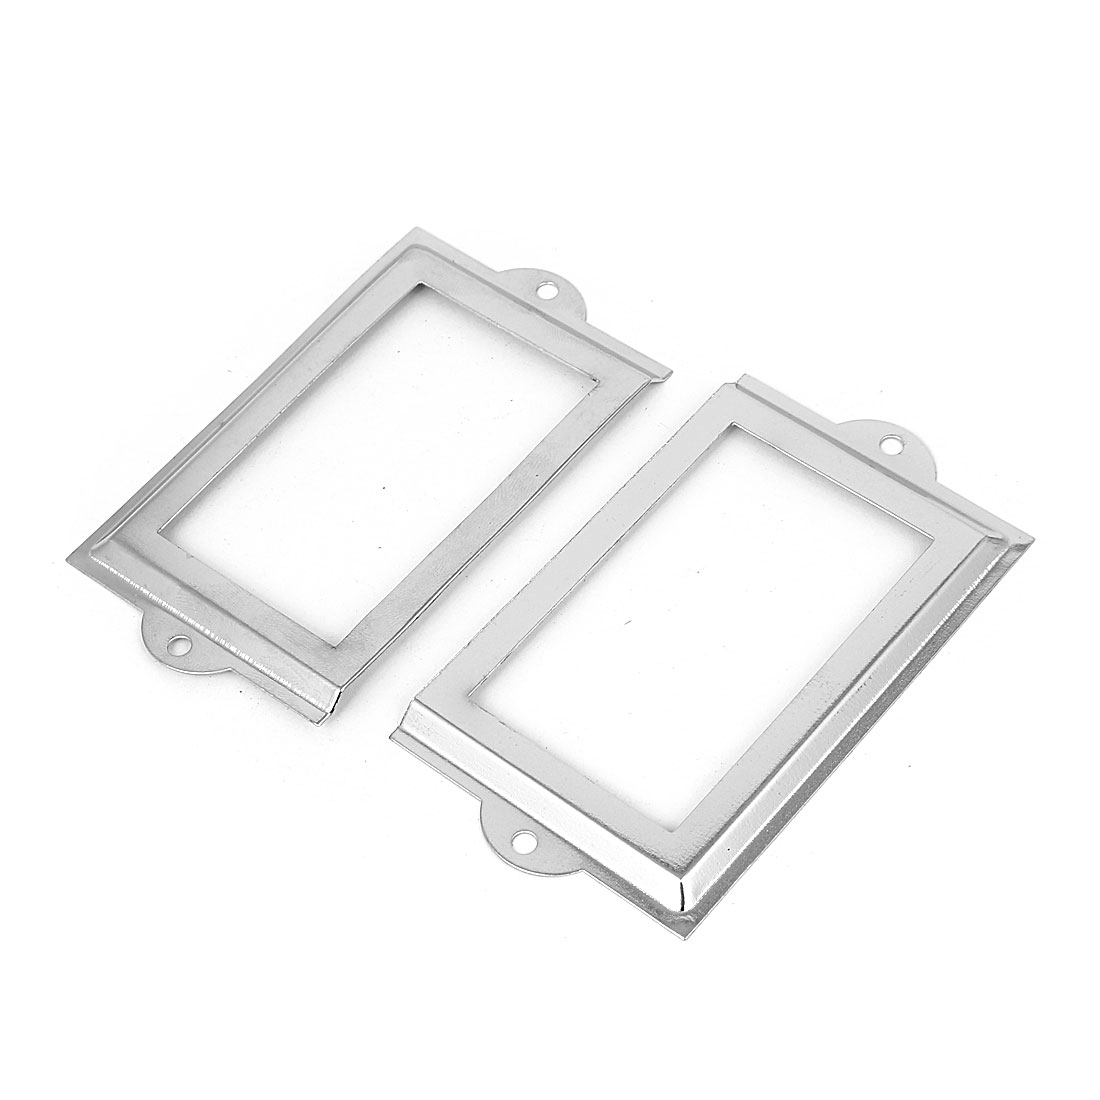 Metal 105mm x 60mm Name Card File Drawer Tag Label Holder Frame Silver Tone 2pcs